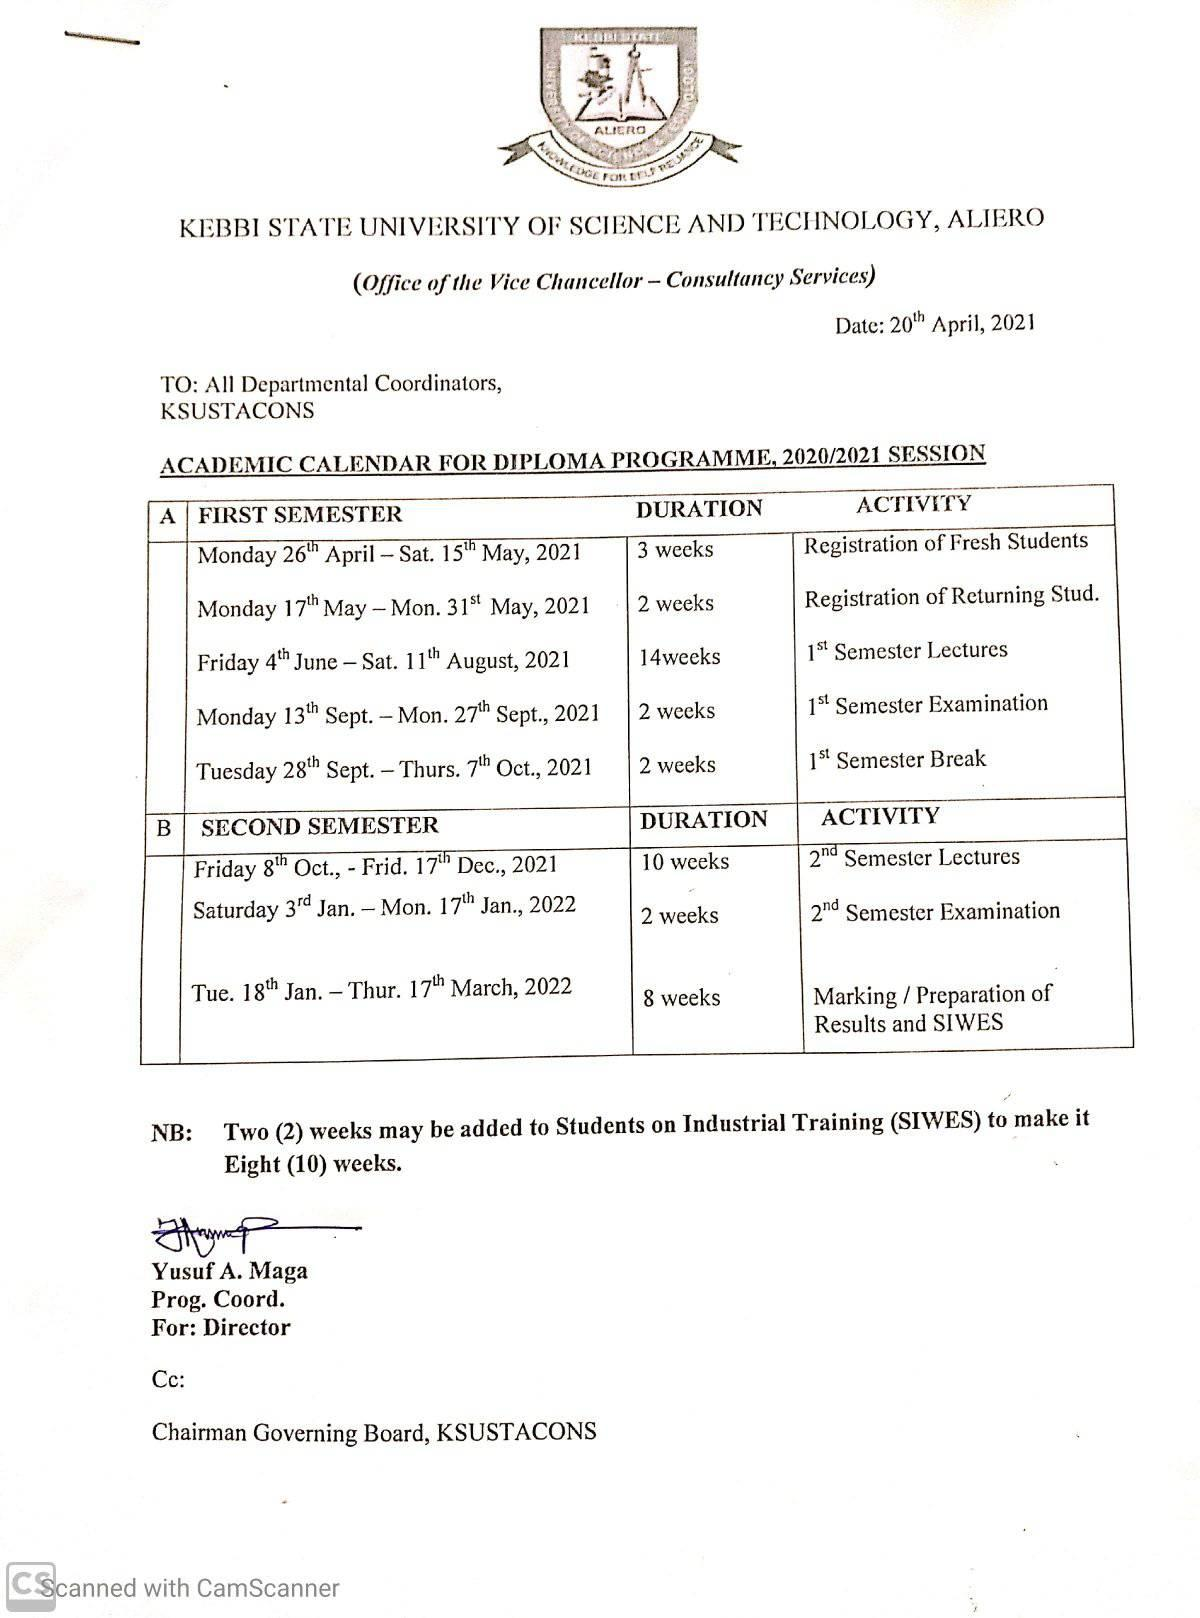 KSUSTA Diploma Academic Calendar Schedule 2020/2021